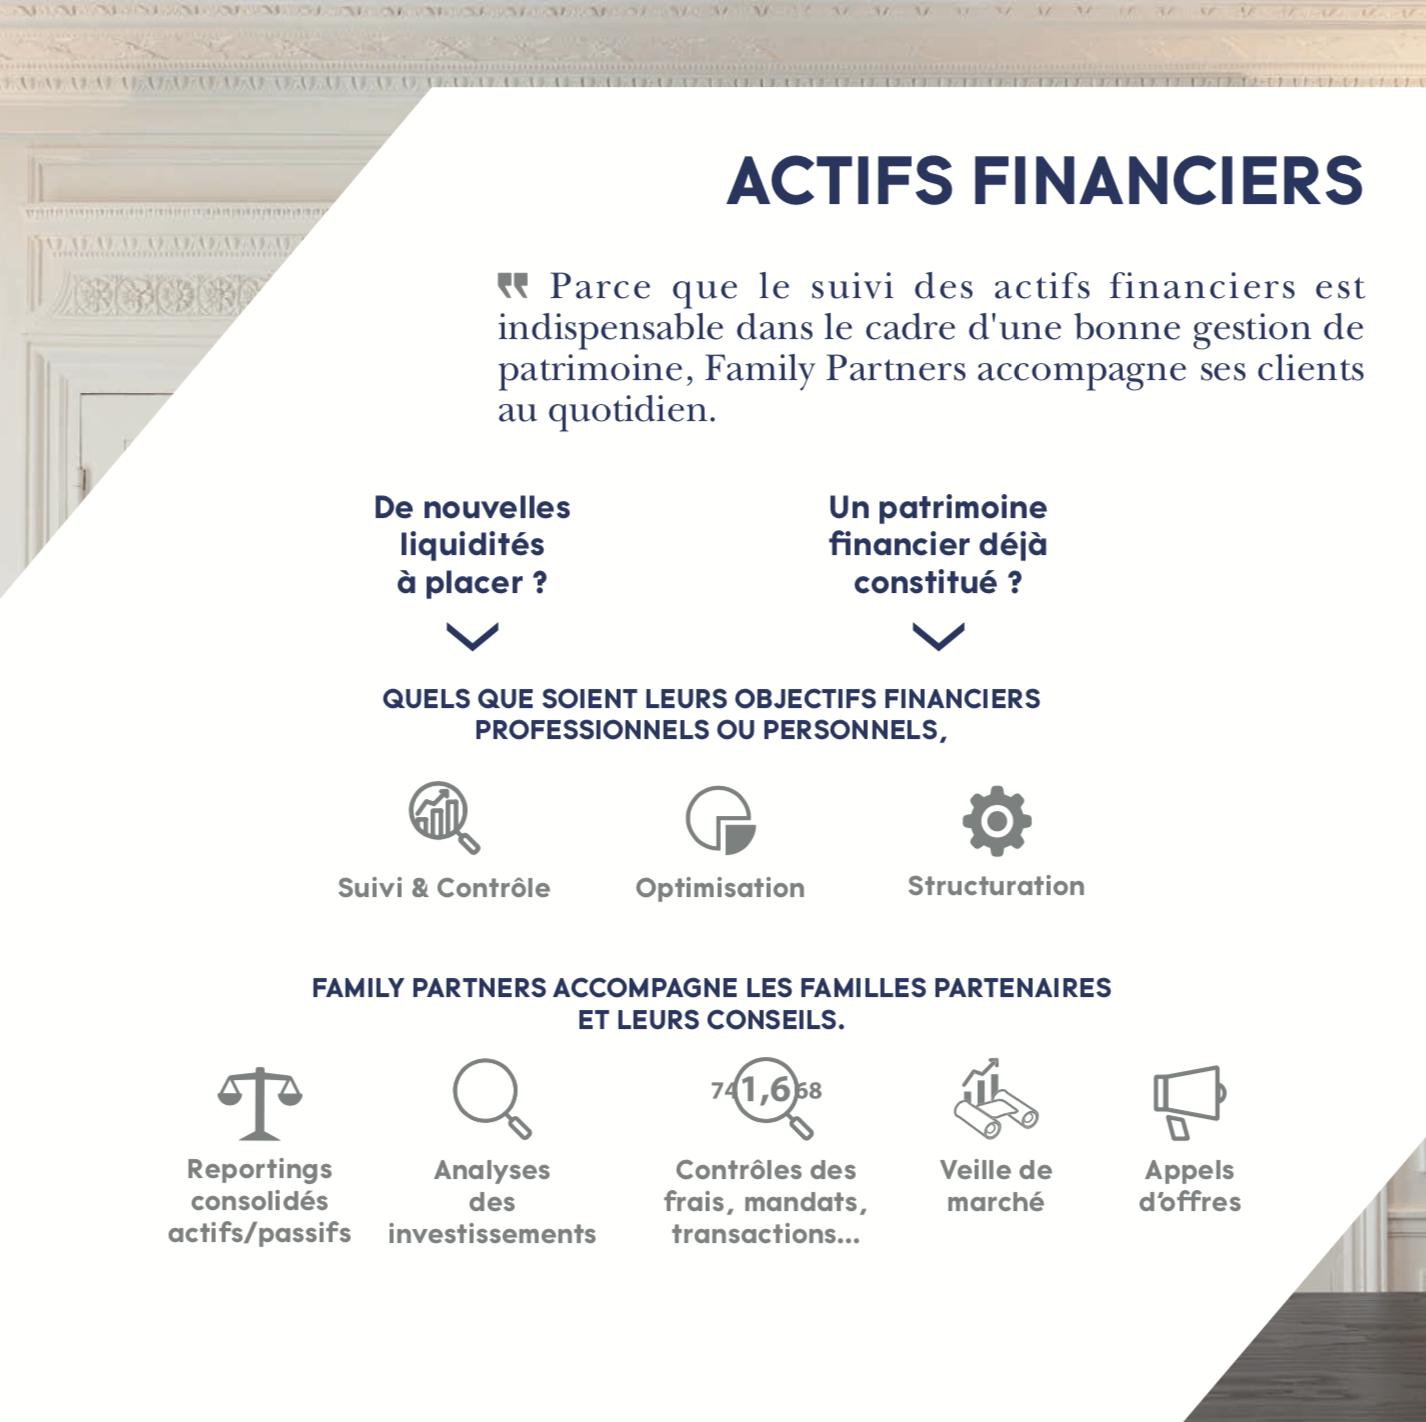 Actifs Financiers